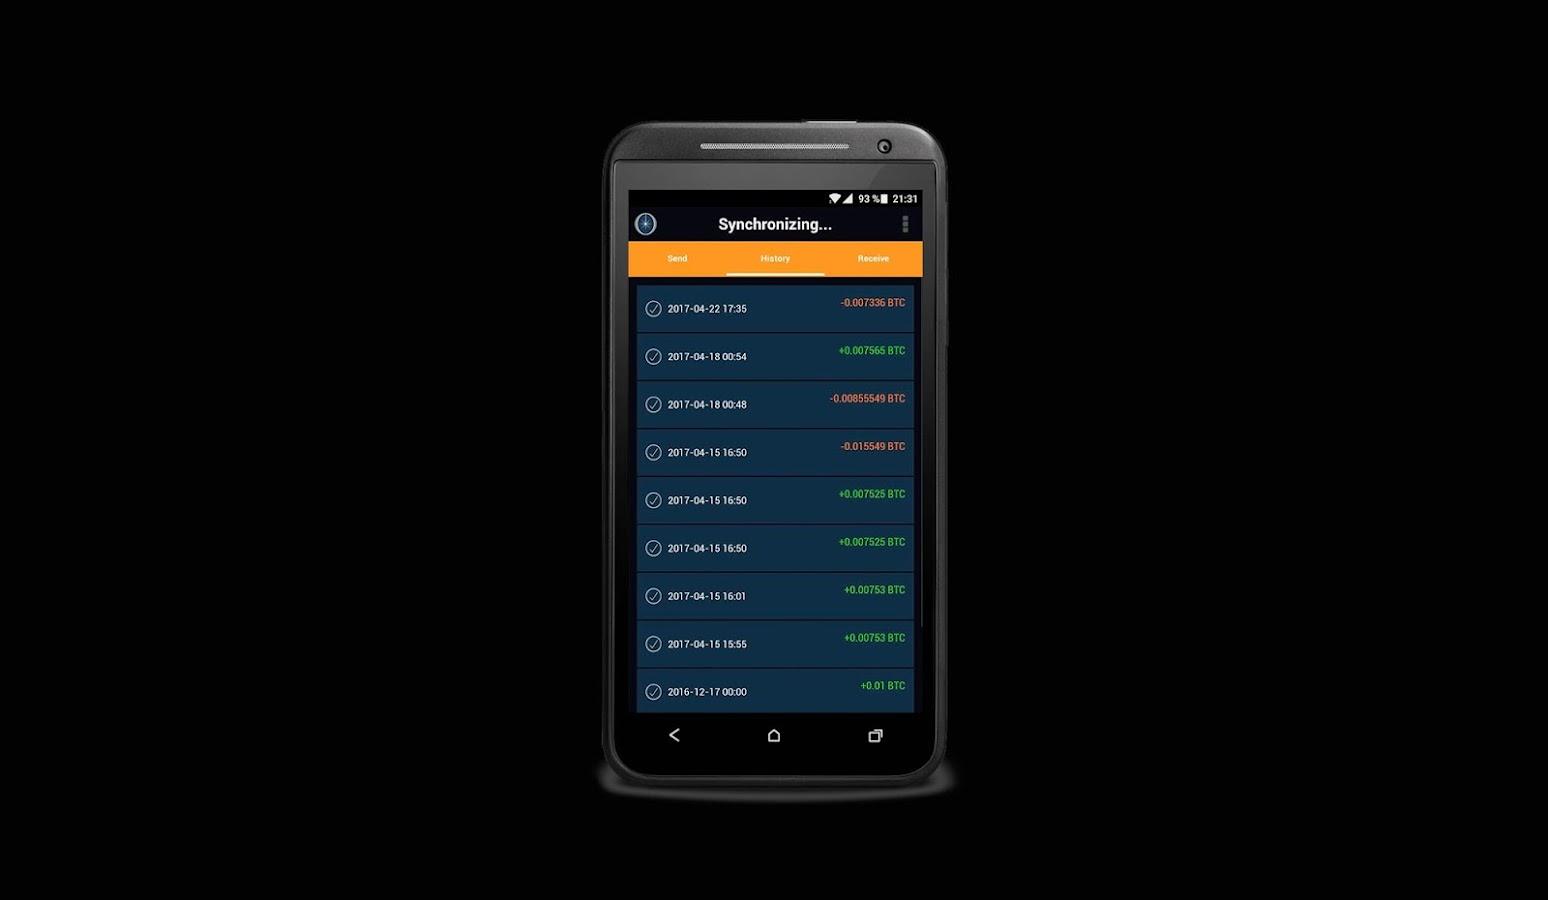 Bitmex Legit or Scam? My Review of dholding ml BTC Exchange